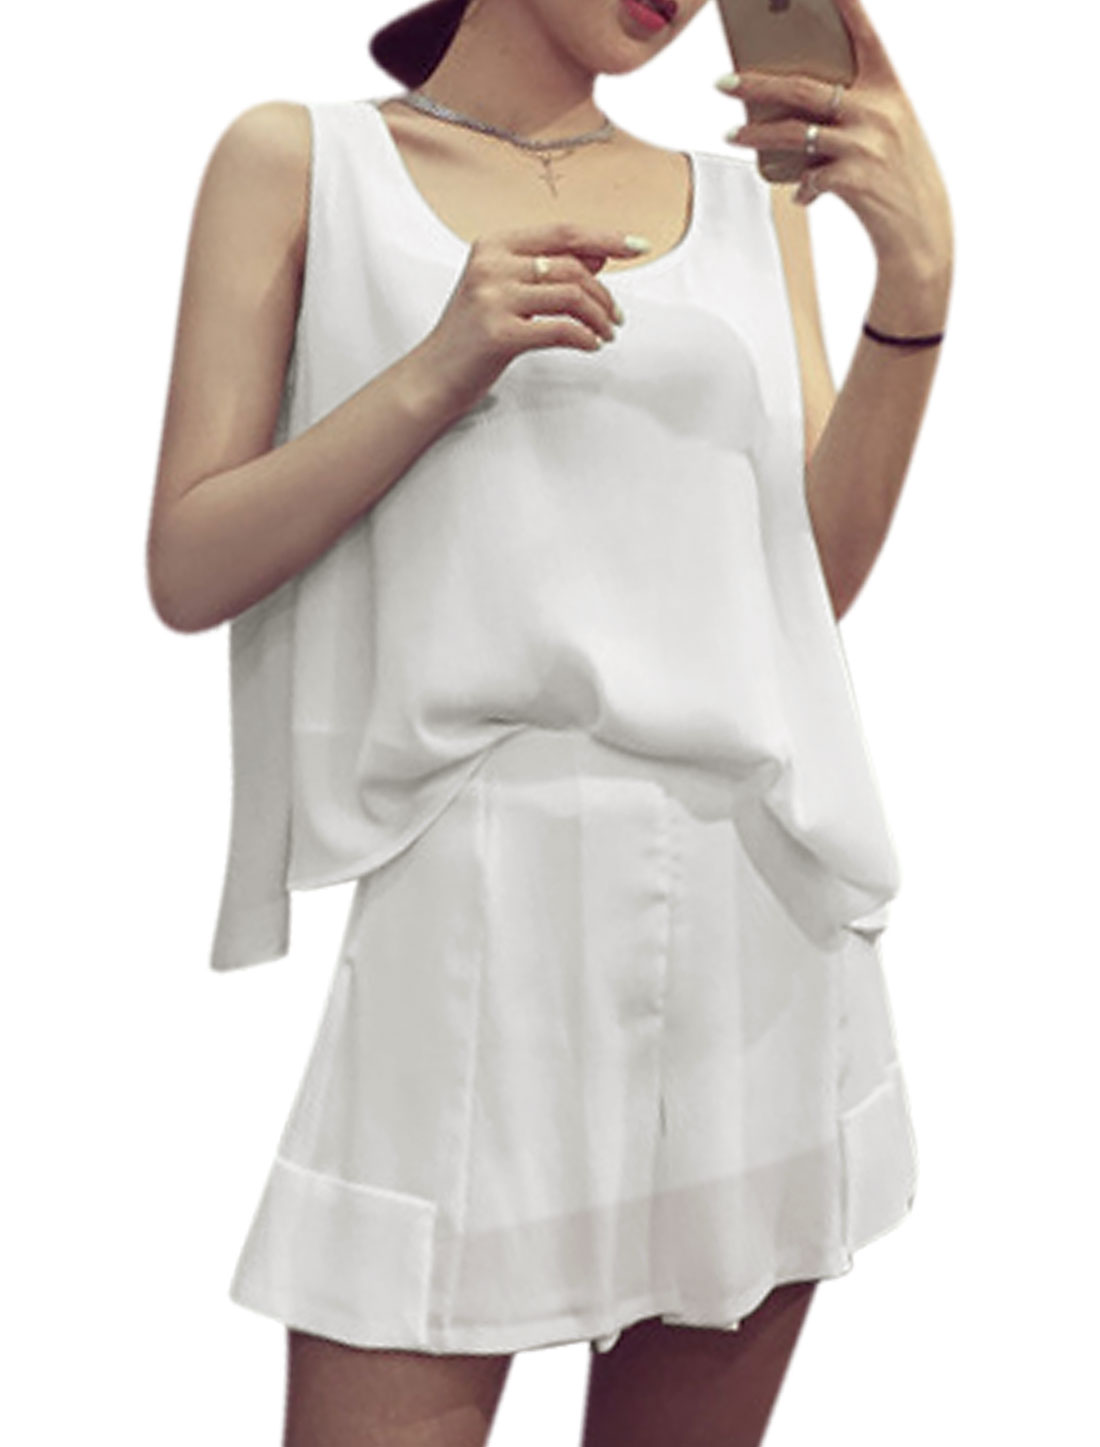 Lady Low High Hem Casual Tops w Seamed Design Chiffon Shorts Sets White XS